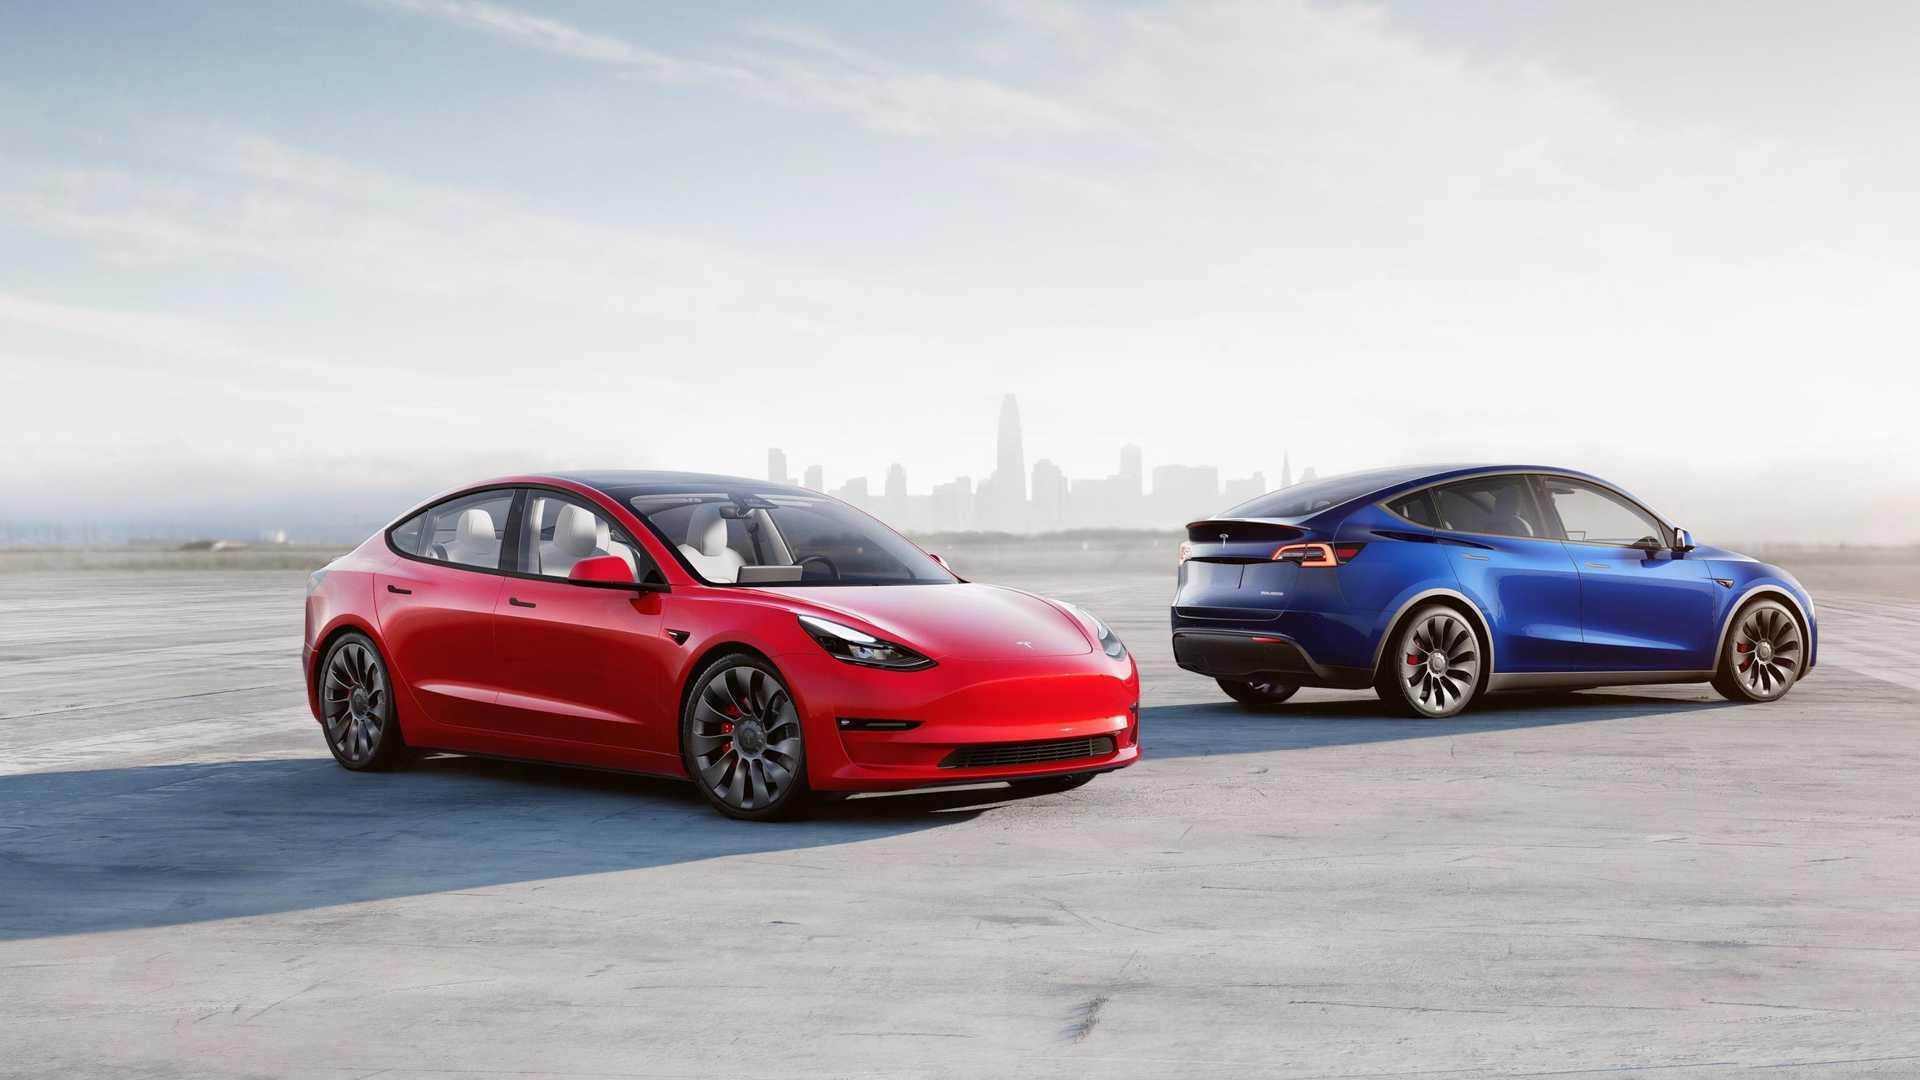 Tesla Is Shifting Standard Range Cars To LFP Batteries Globally